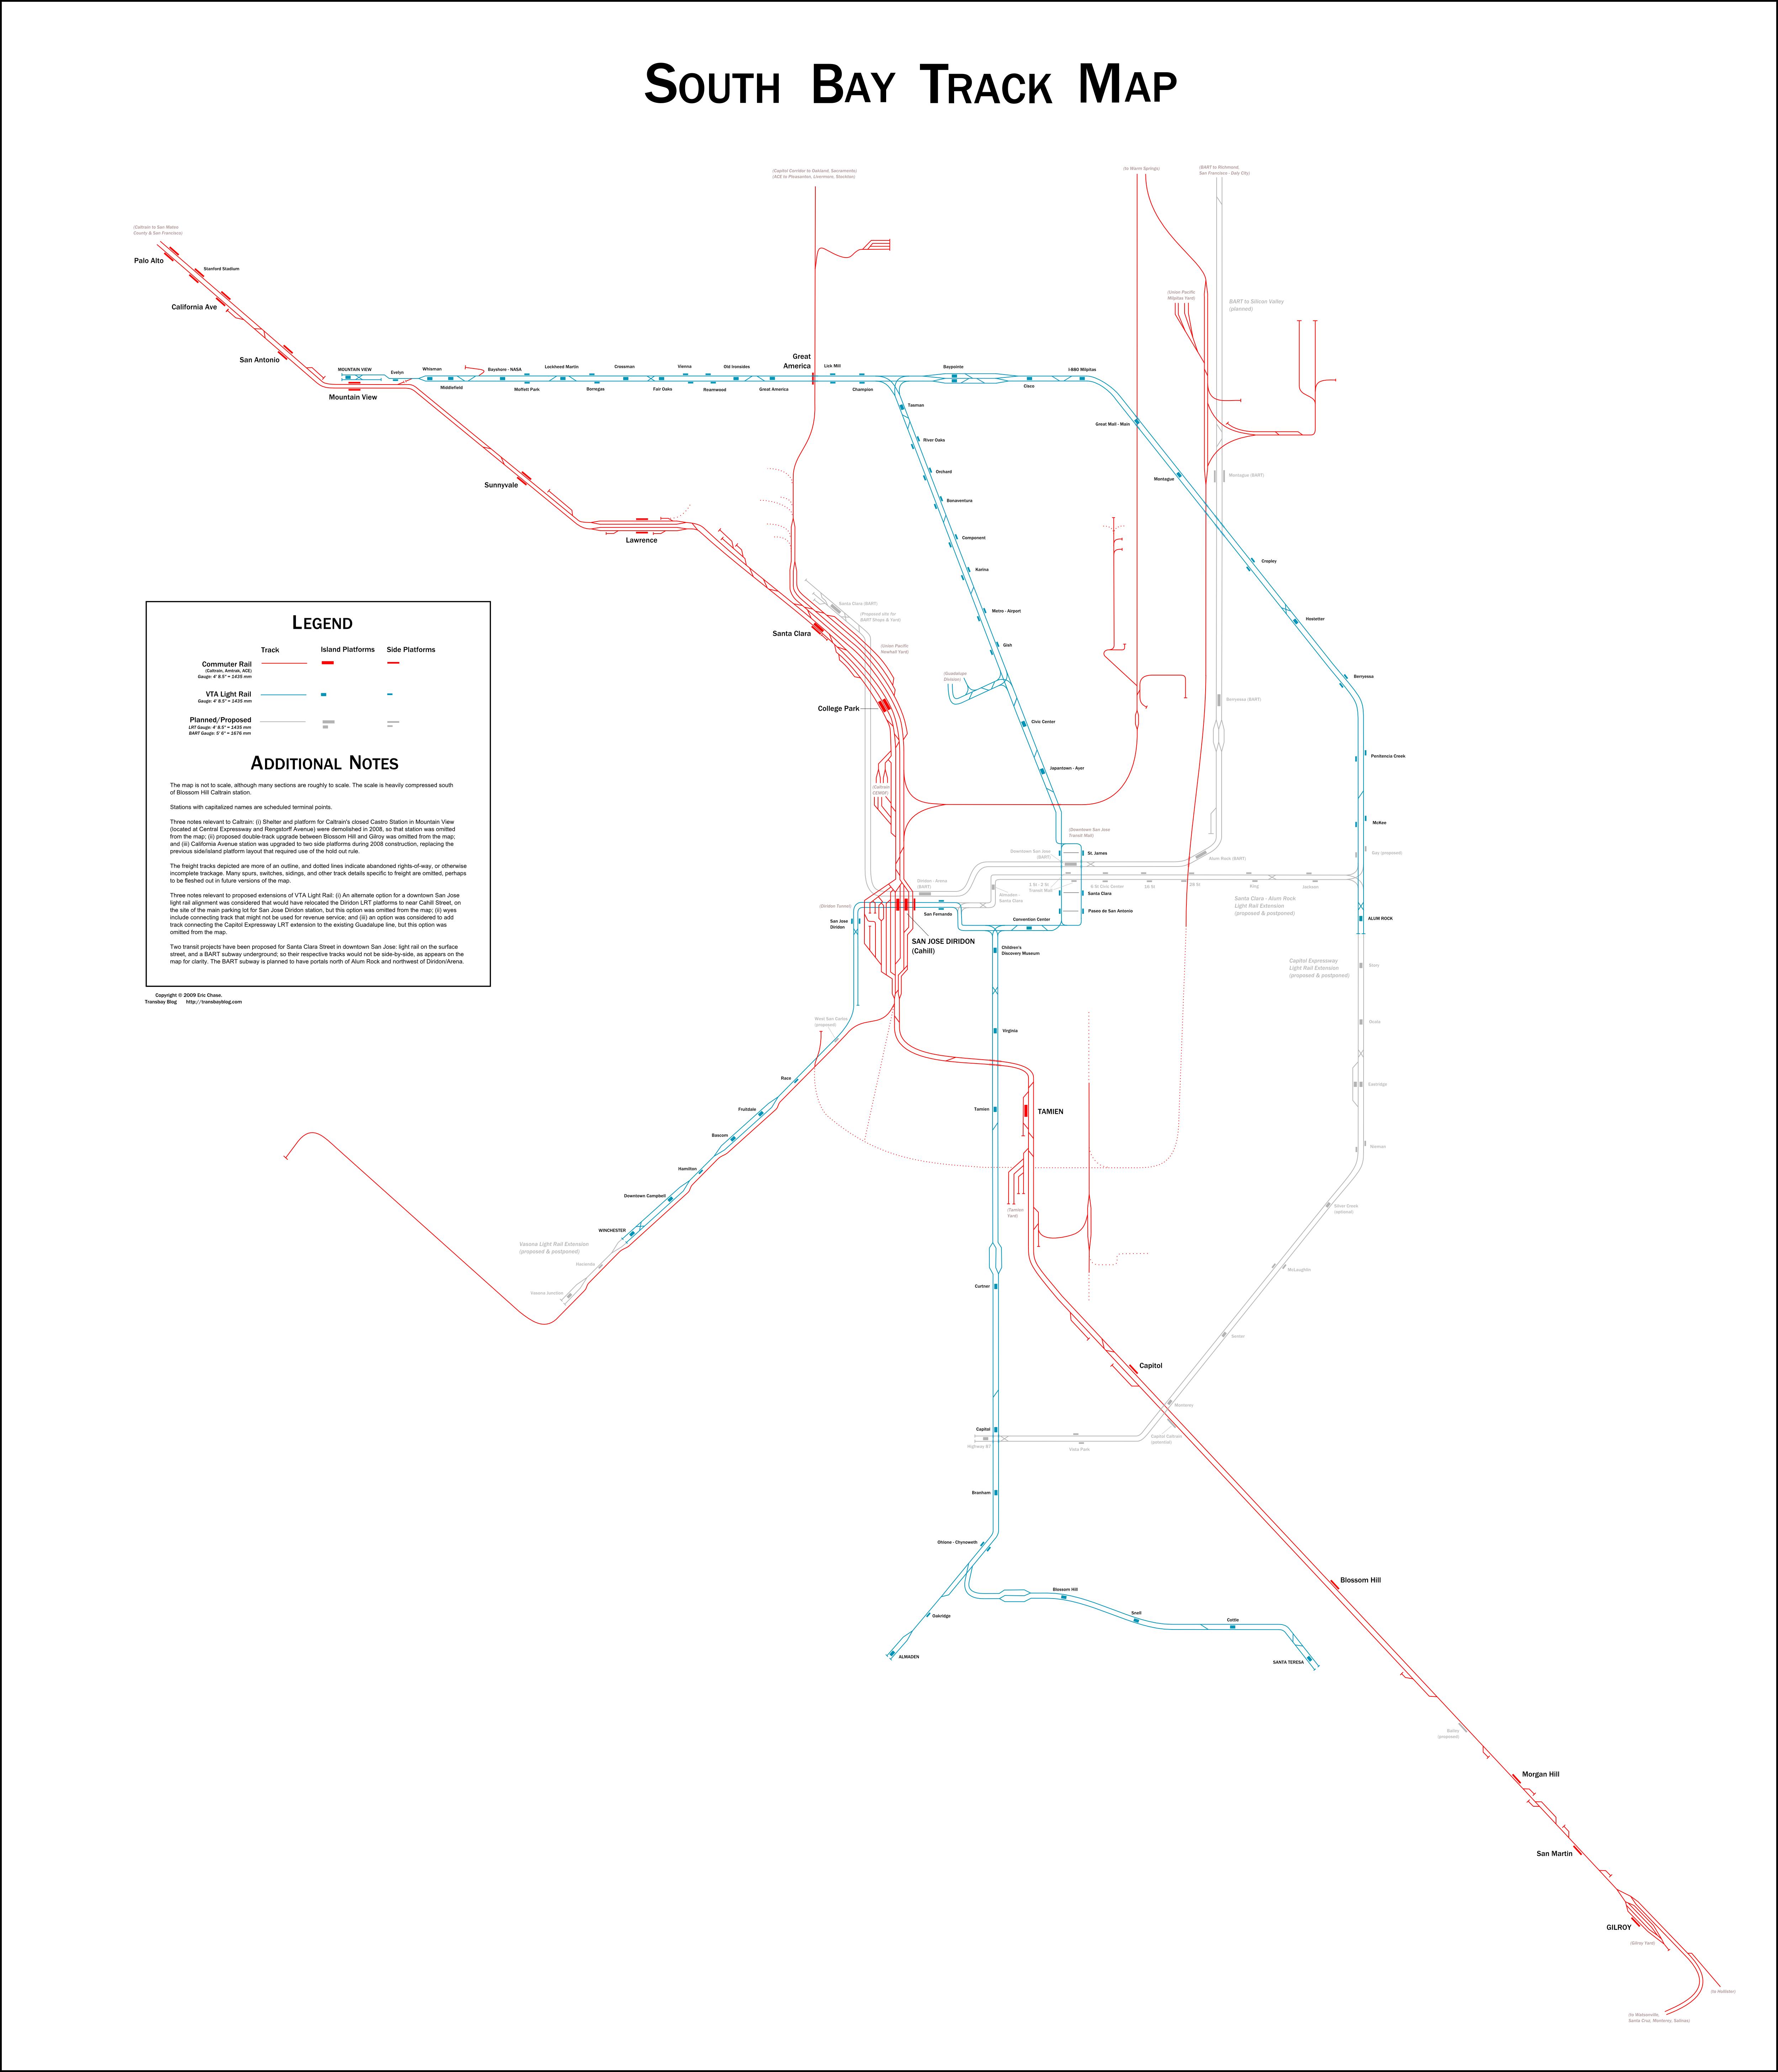 South Bay Track Map | Transbay Blog on